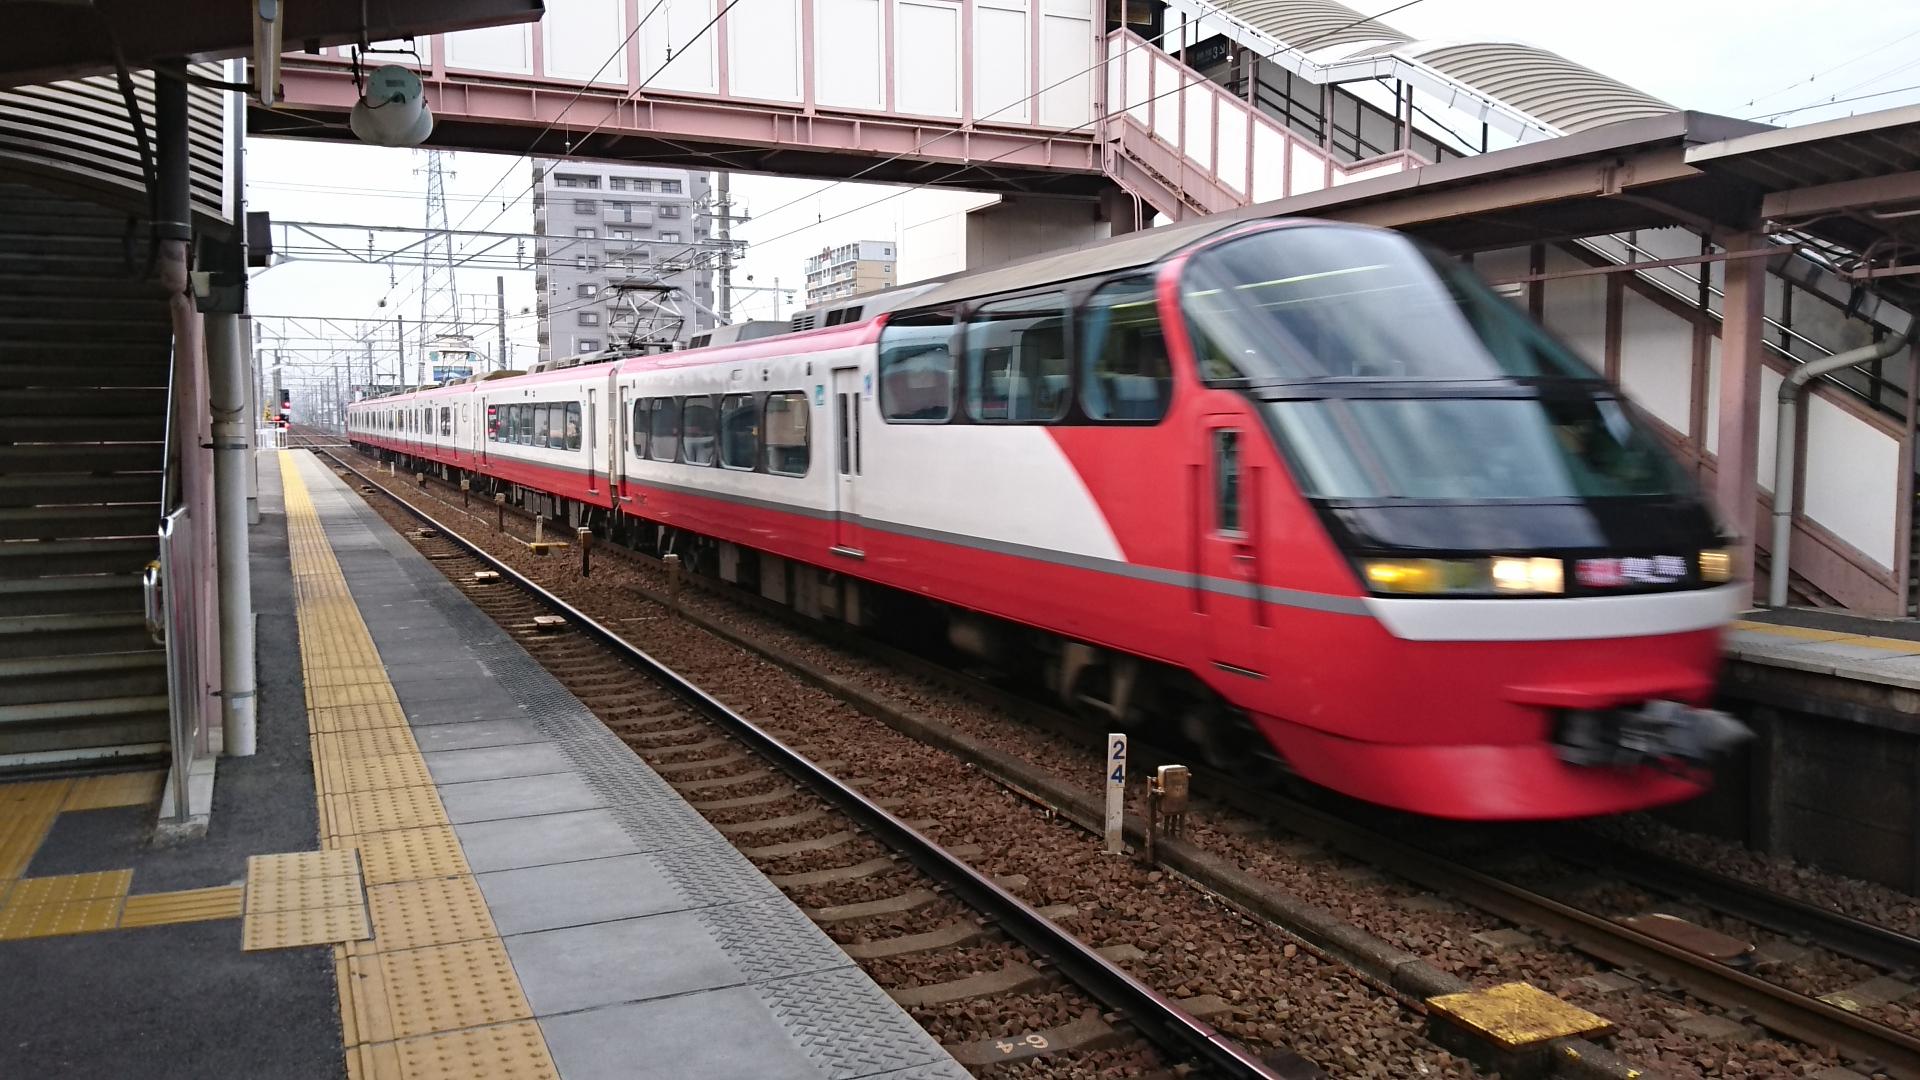 2016.12.26 名鉄 (16) 矢作橋 - 豊橋いき快速特急(通過)1920-1080